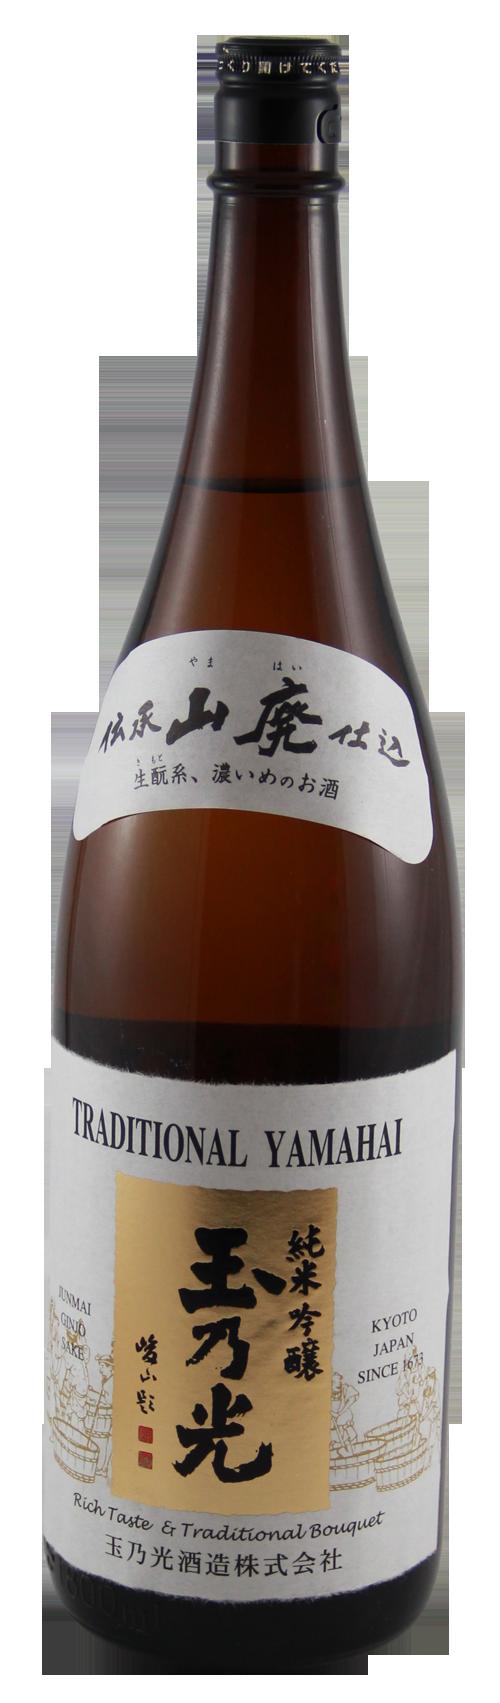 Tamano Hikari Yamahai Junmai Ginjyo Sake